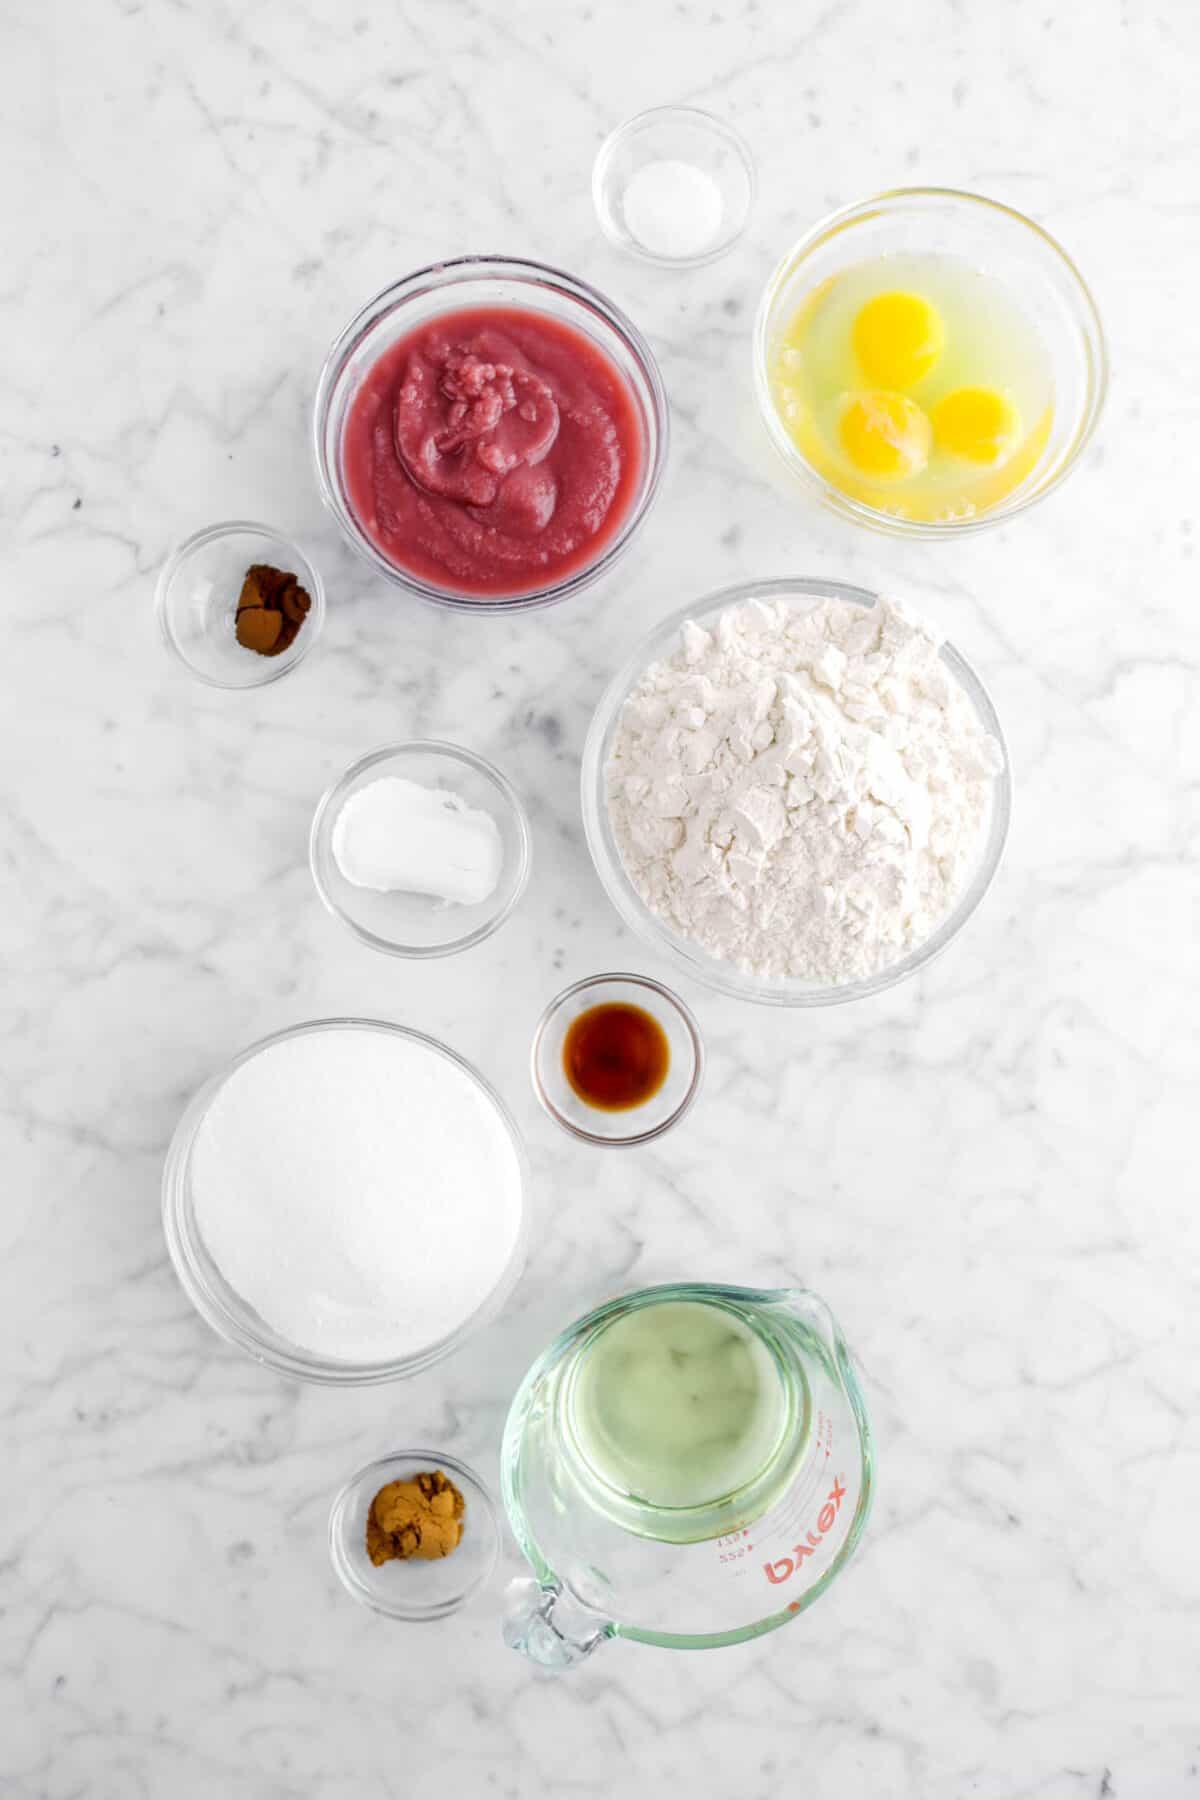 salt, baby food, cloves, eggs, flour, baking powder, vanilla, sugar, vegetable oil, and cinnamon in glass bowls